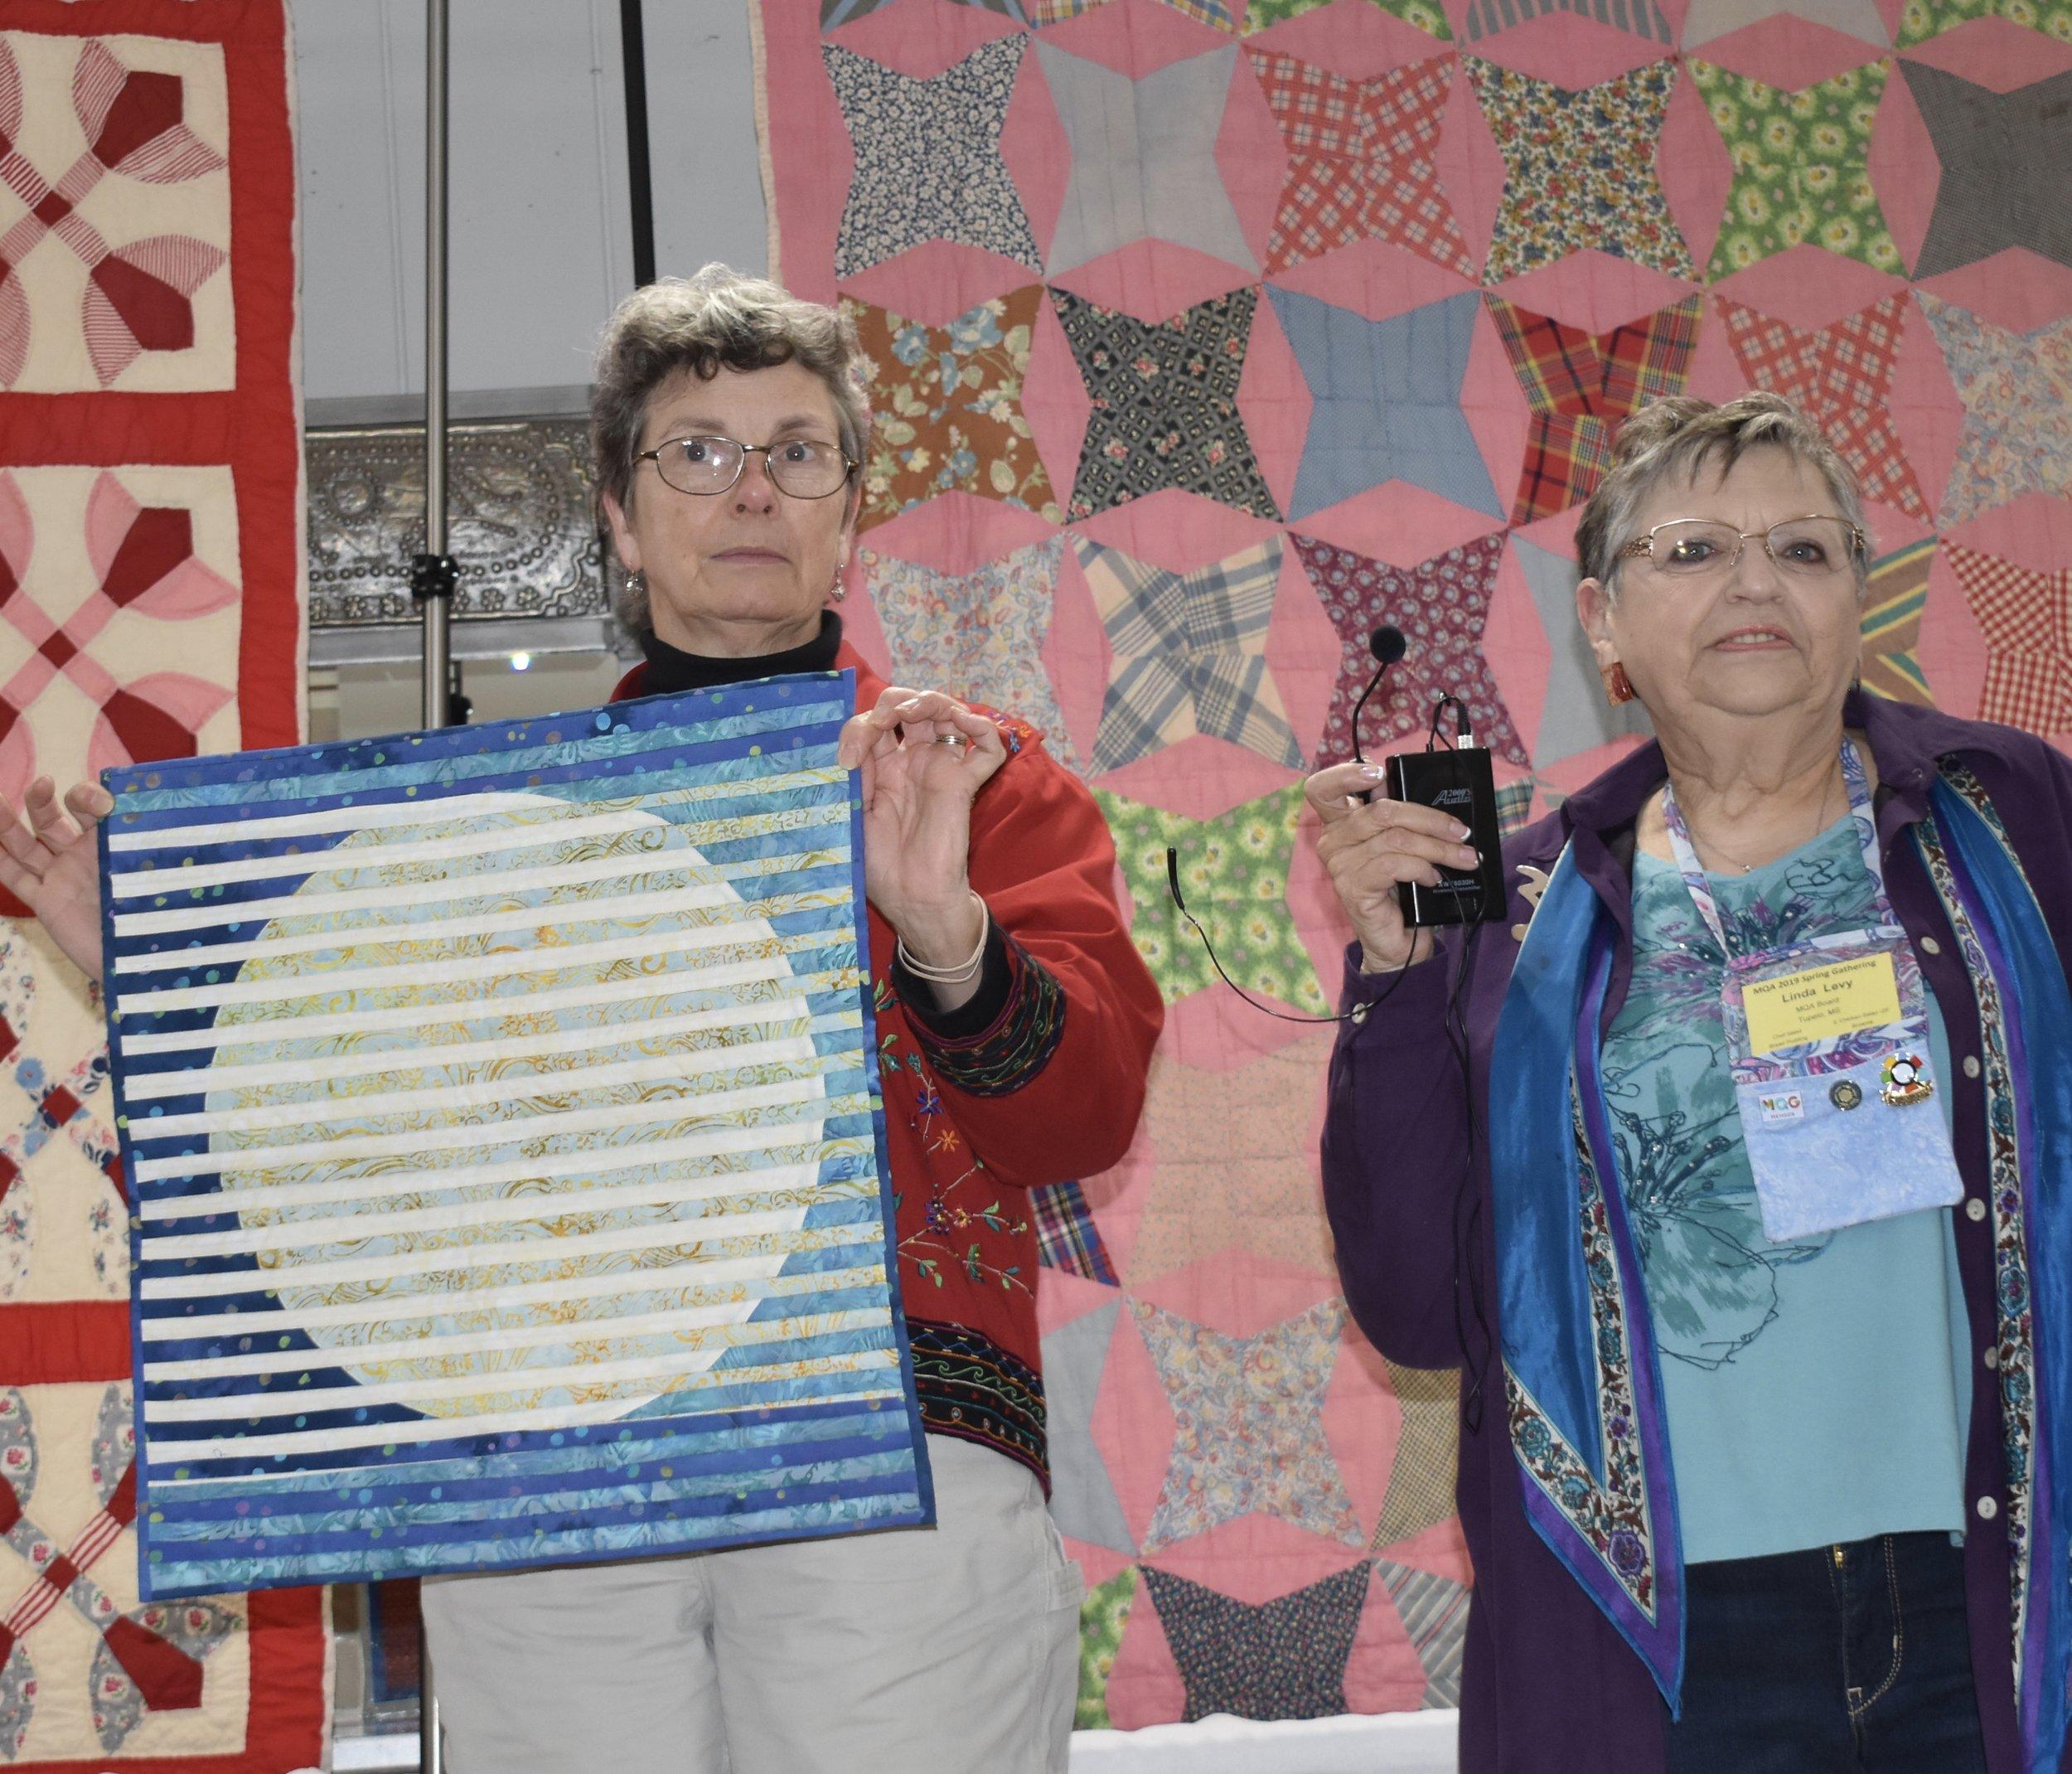 - Nancy also showed her interleave quilt.